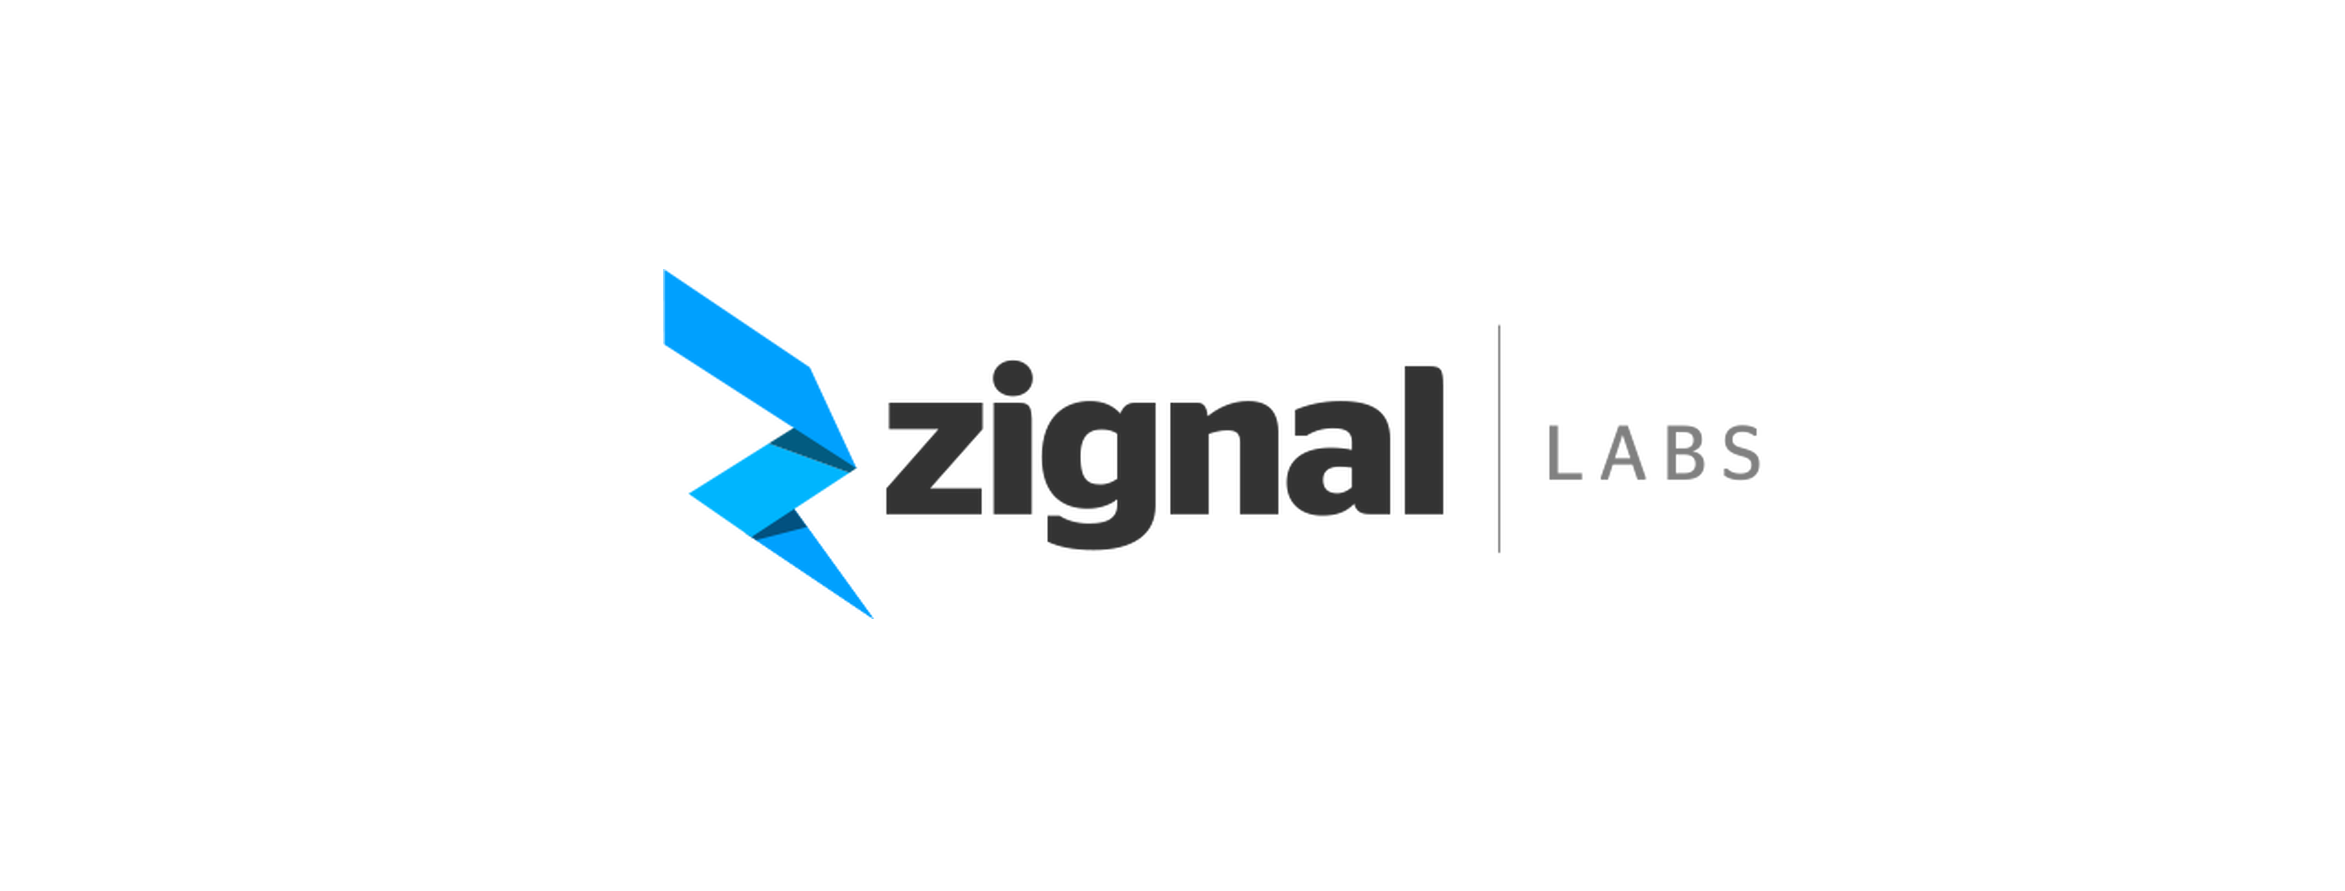 Zignal-logo-1.png